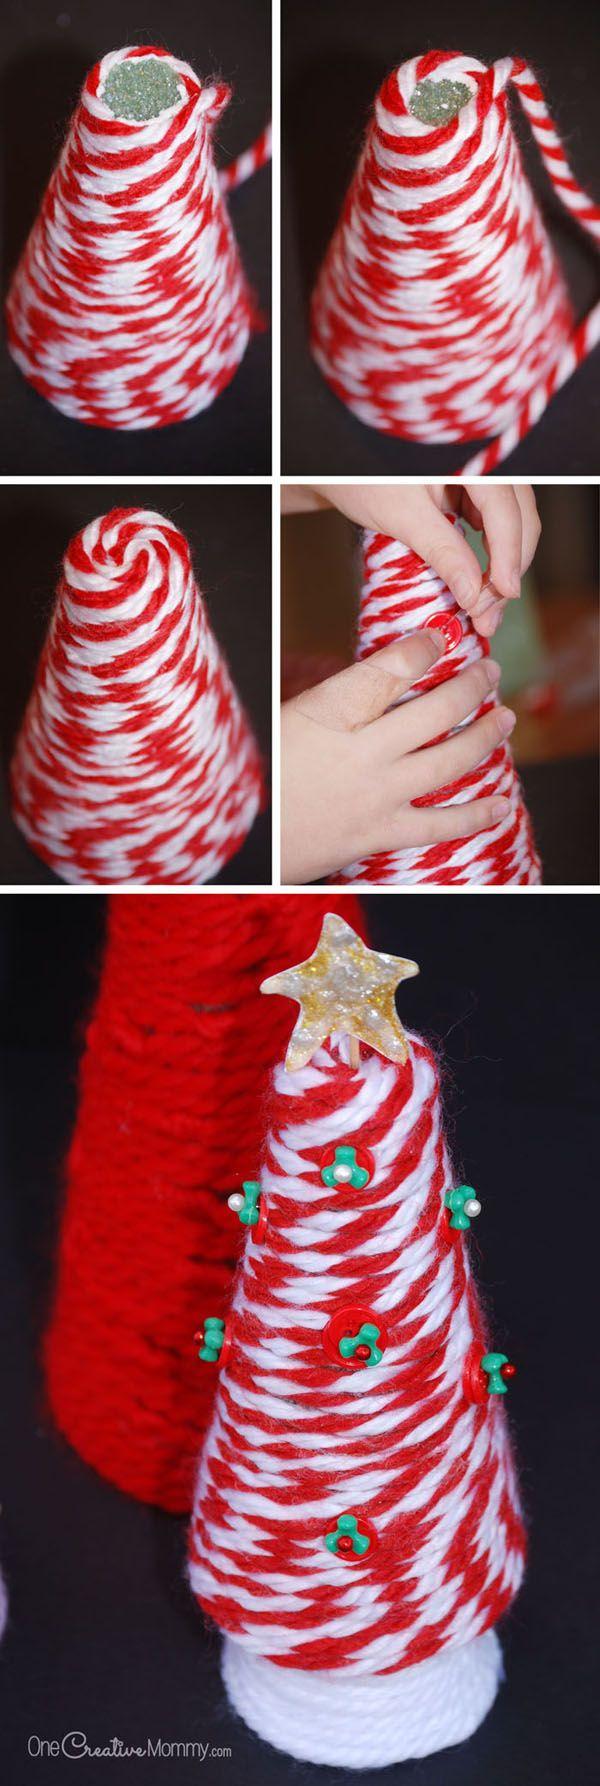 Yarn Tree Christmas Craft for Kids